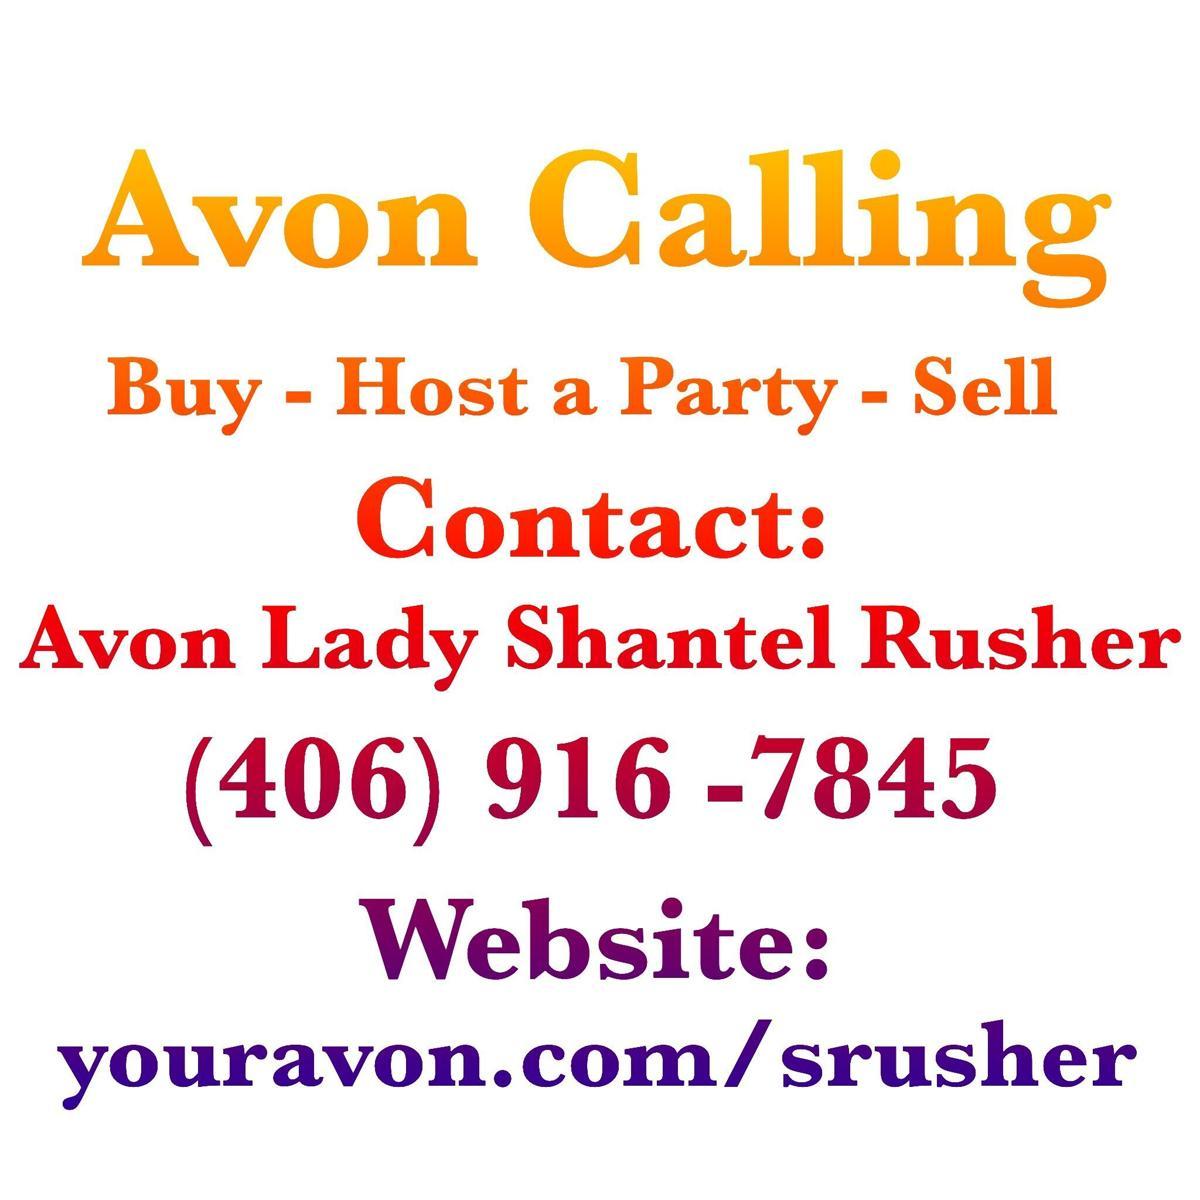 Avon Calling image 1